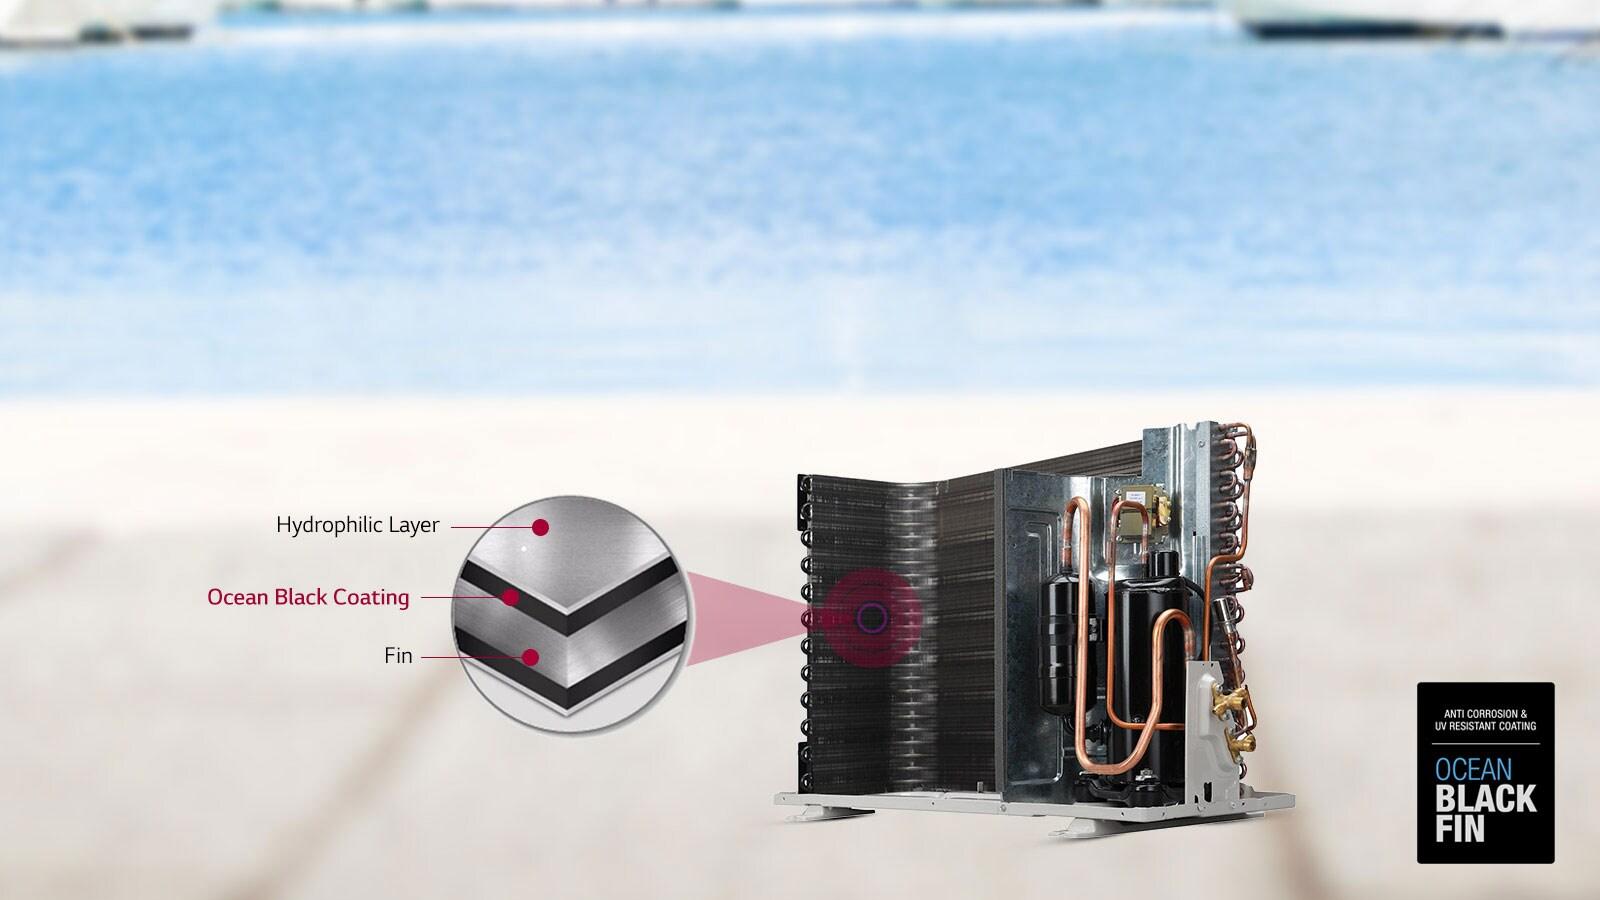 LG LS-Q12HNZA Ocean Black Fin